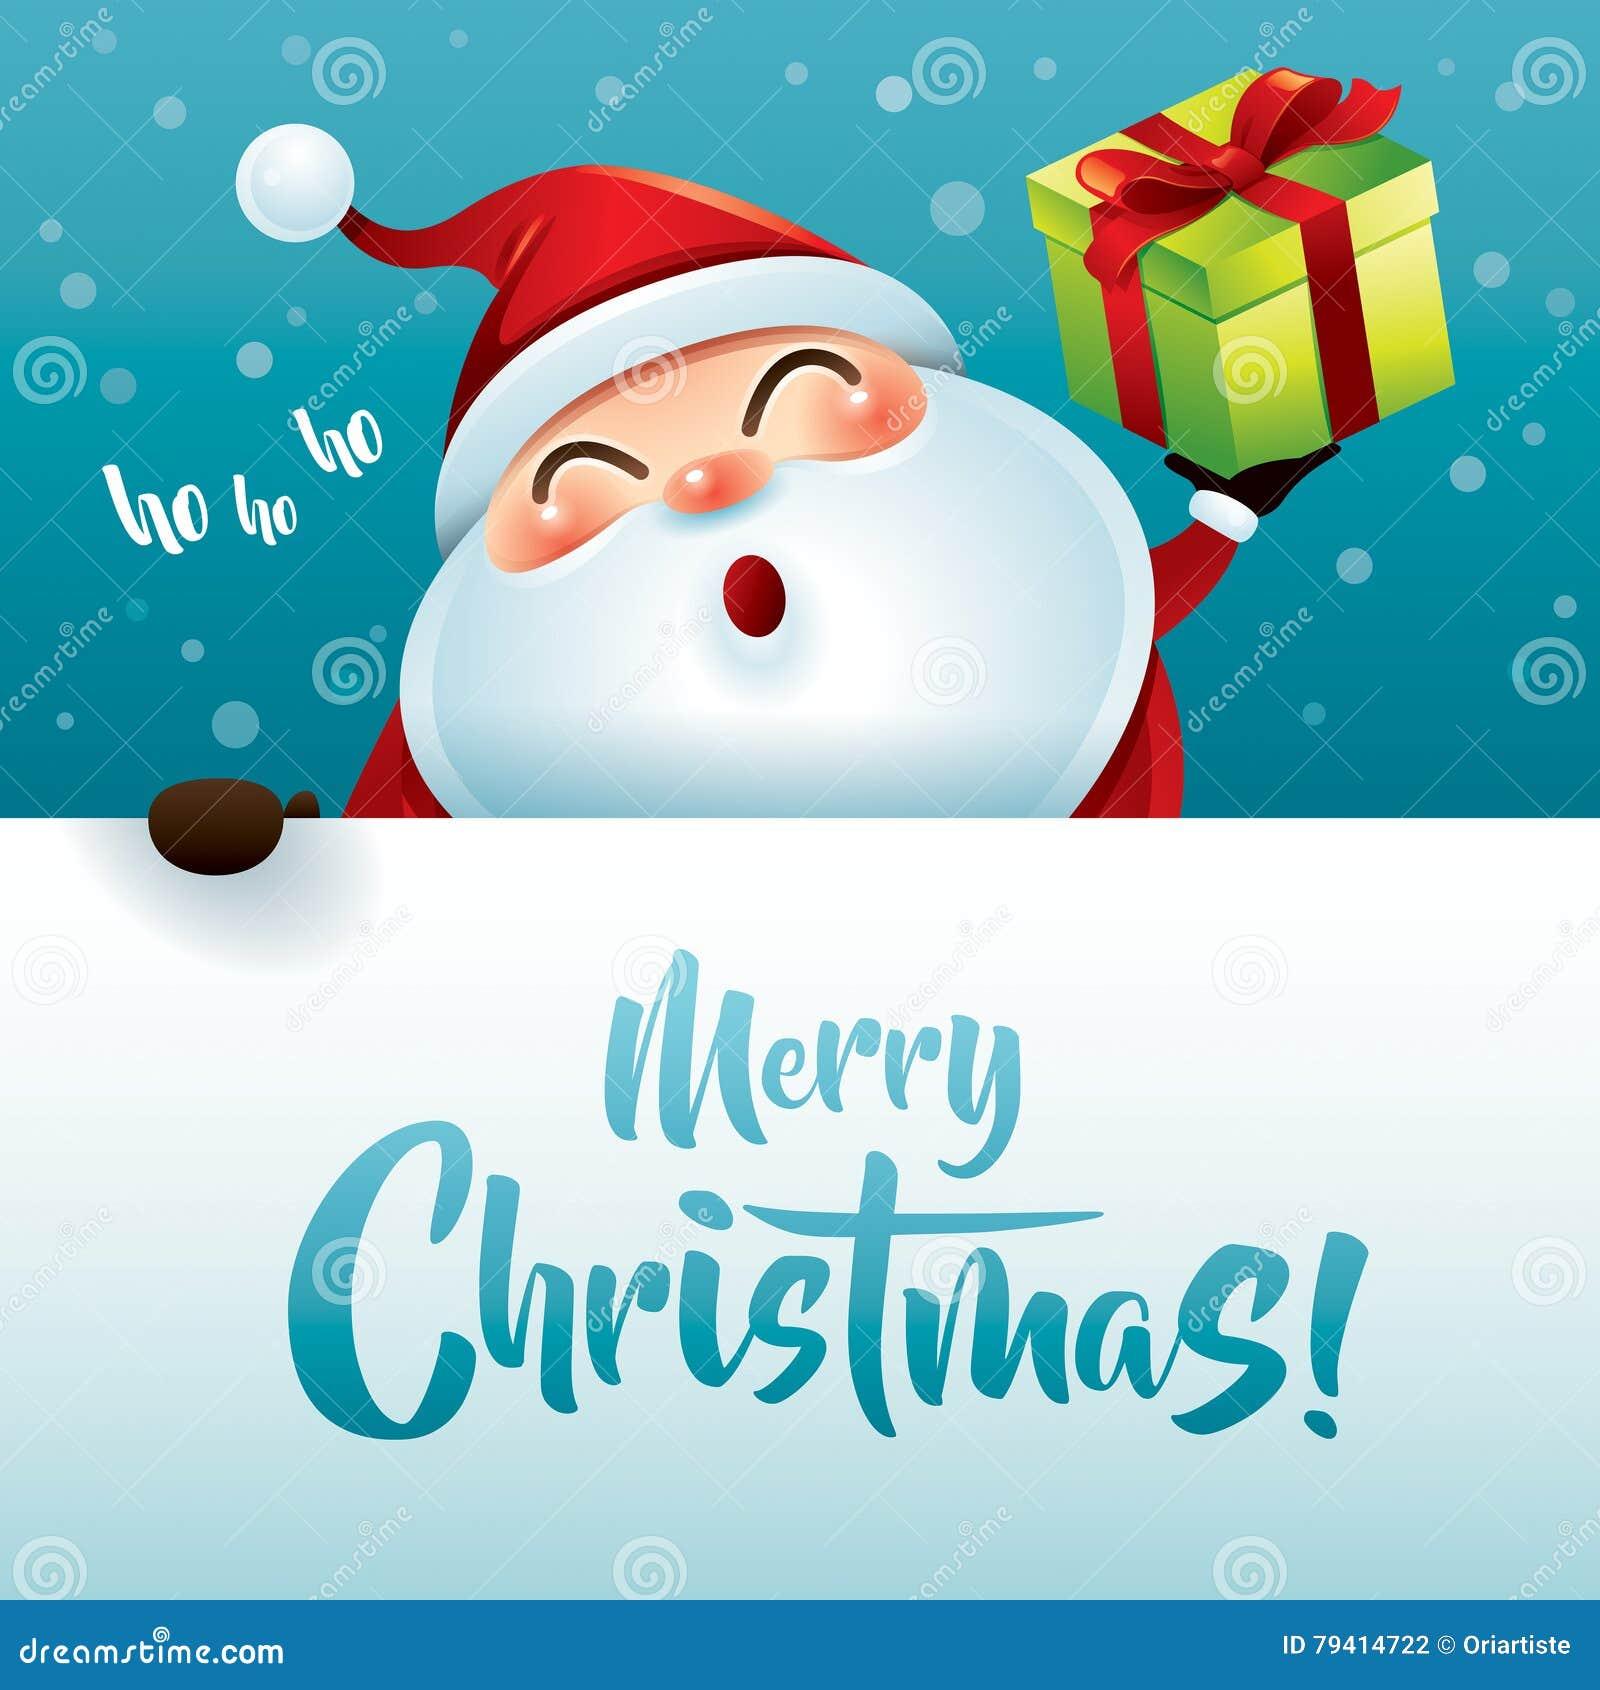 Ho Ho Ho Merry Christmas.Ho Ho Ho Merry Christmas Stock Vector Illustration Of